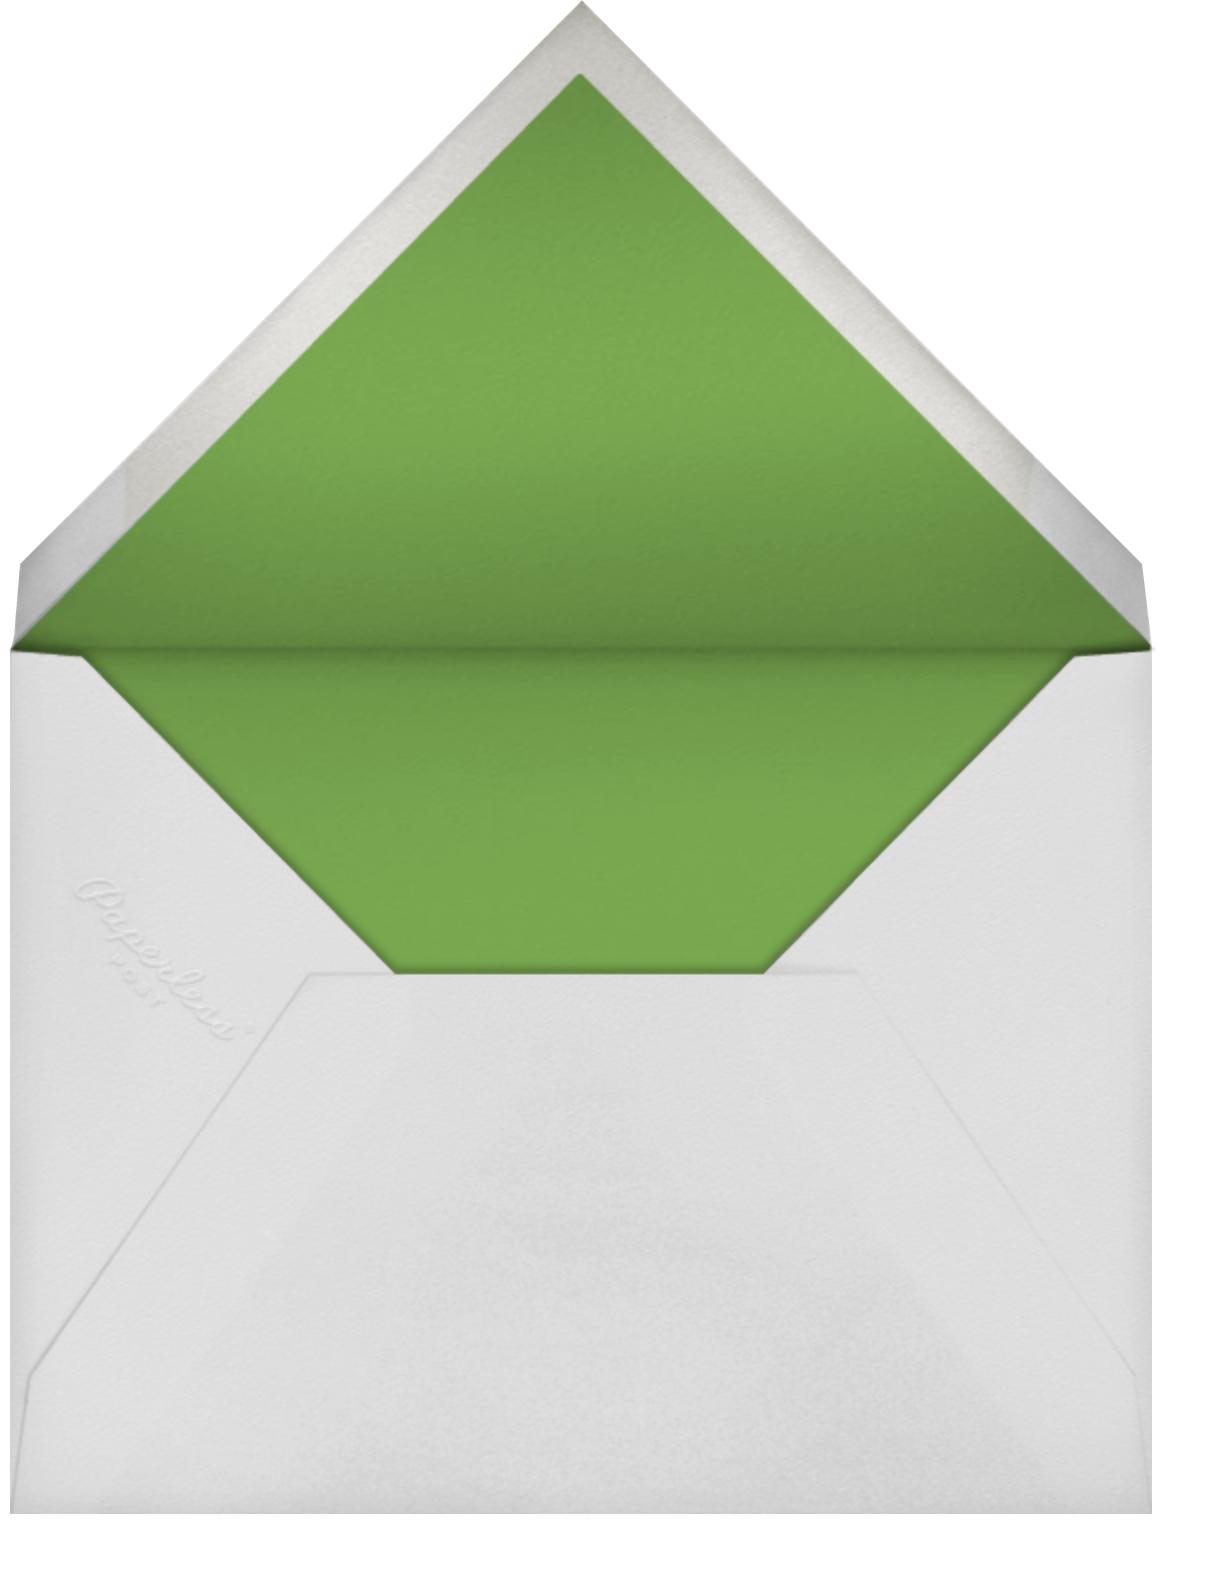 Cadogan Blue Square - Paperless Post - Envelope